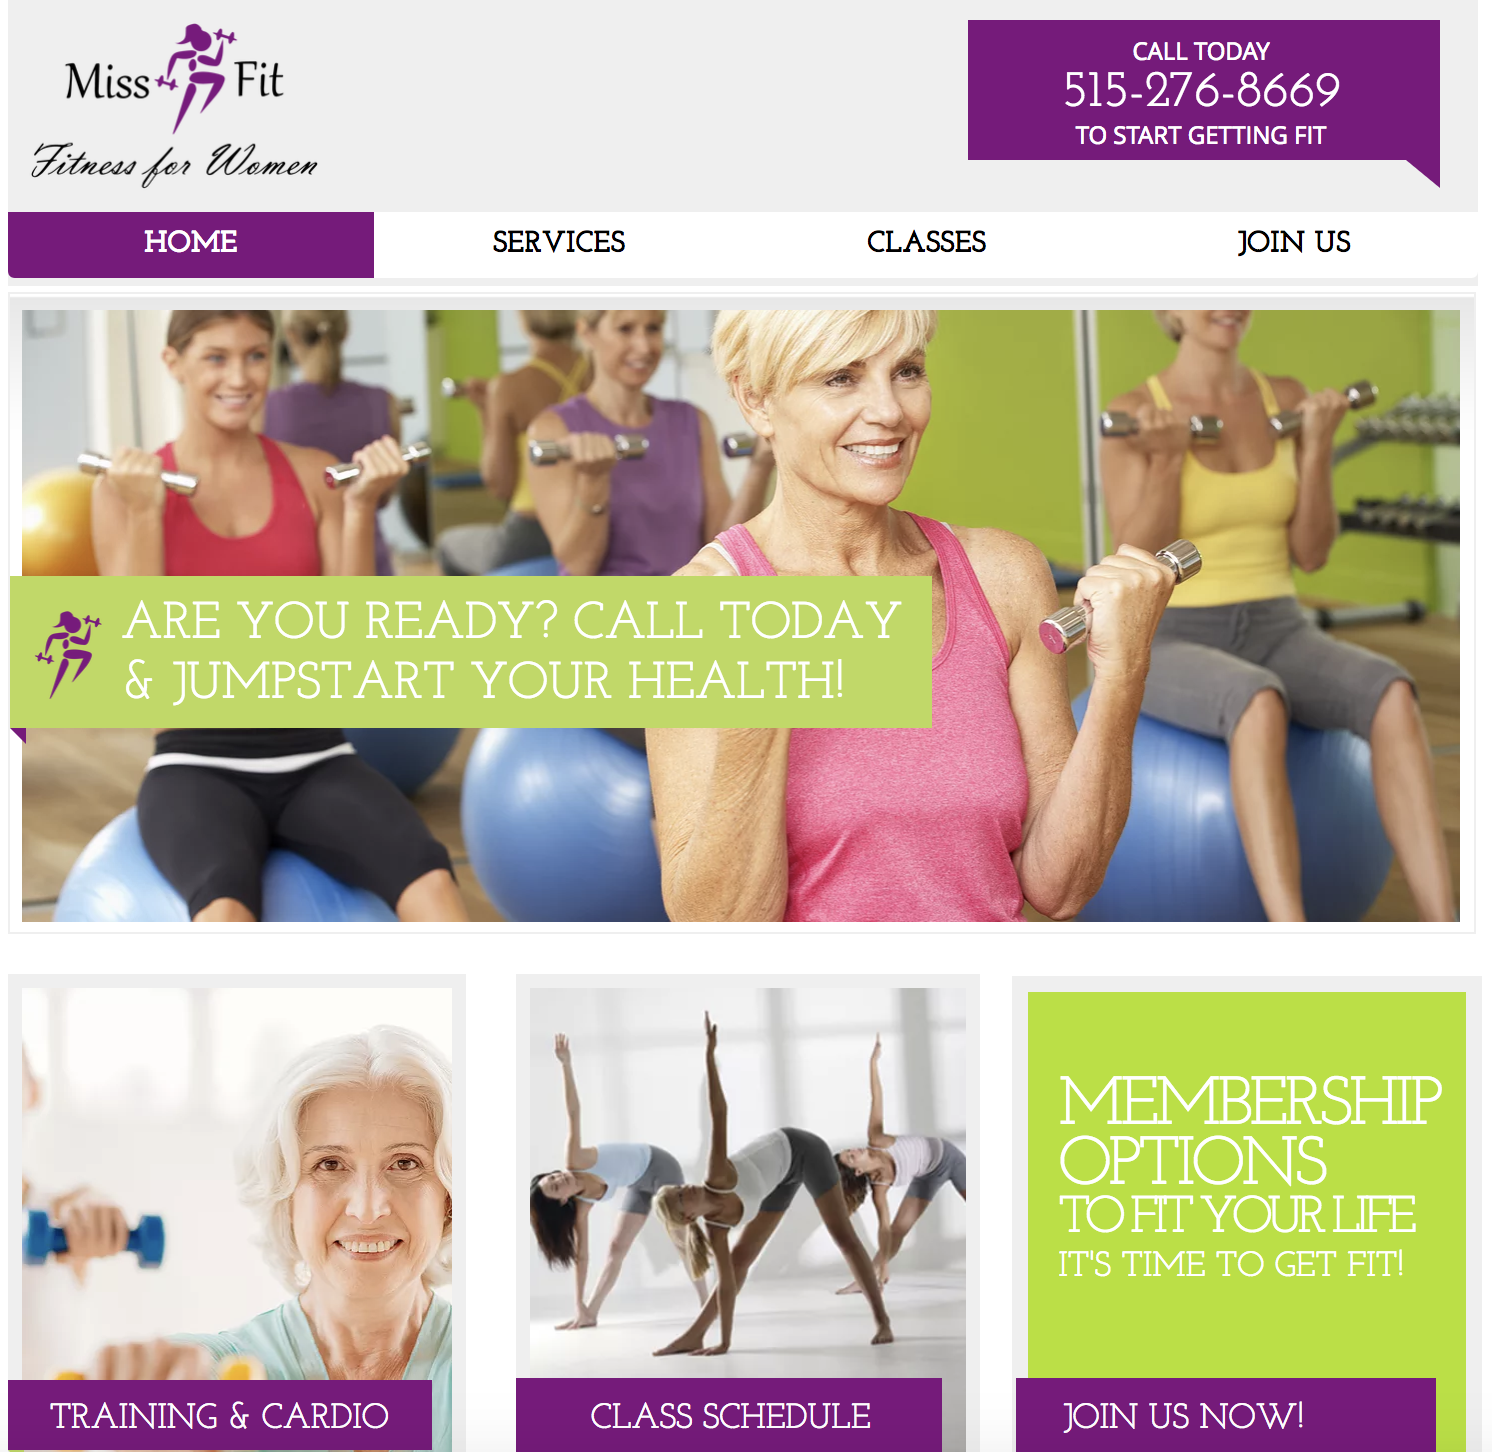 Miss Fit Website